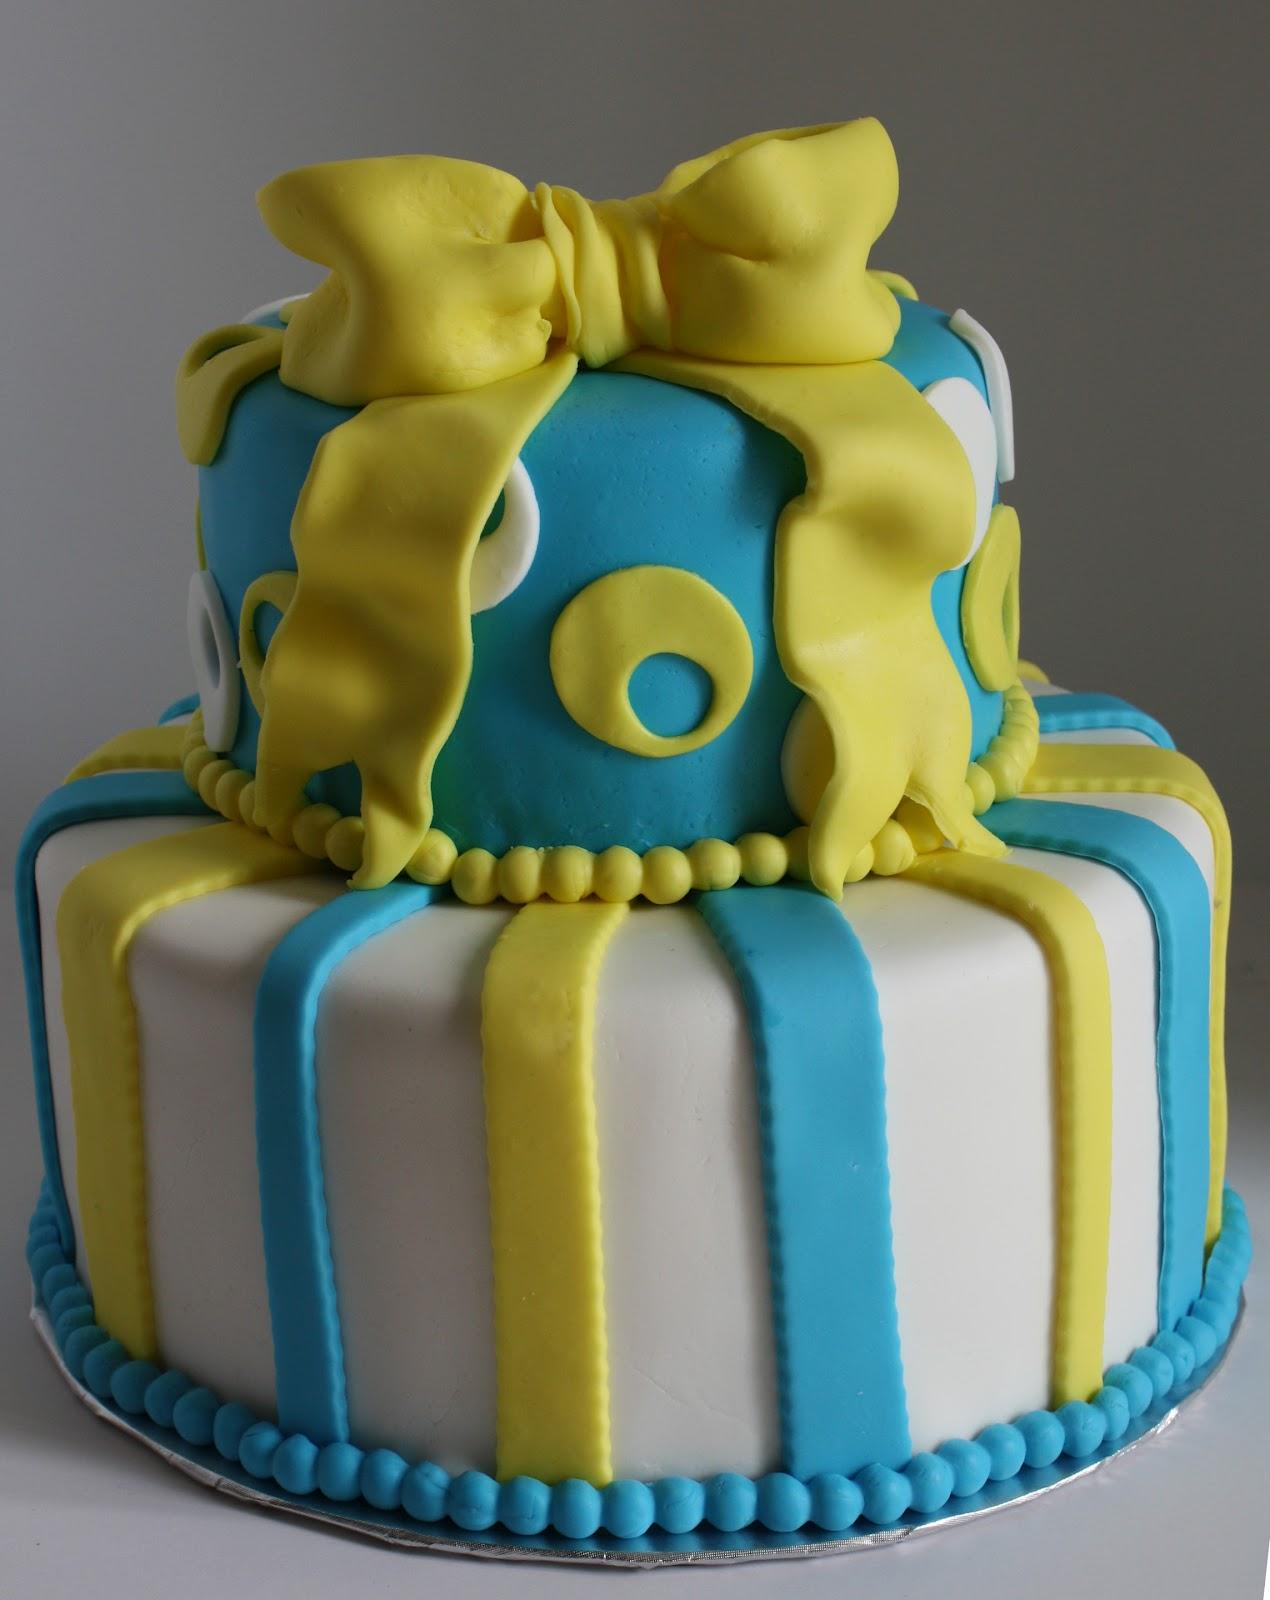 Sab Cakes Yellow And Blue Bow Babyshower Cake